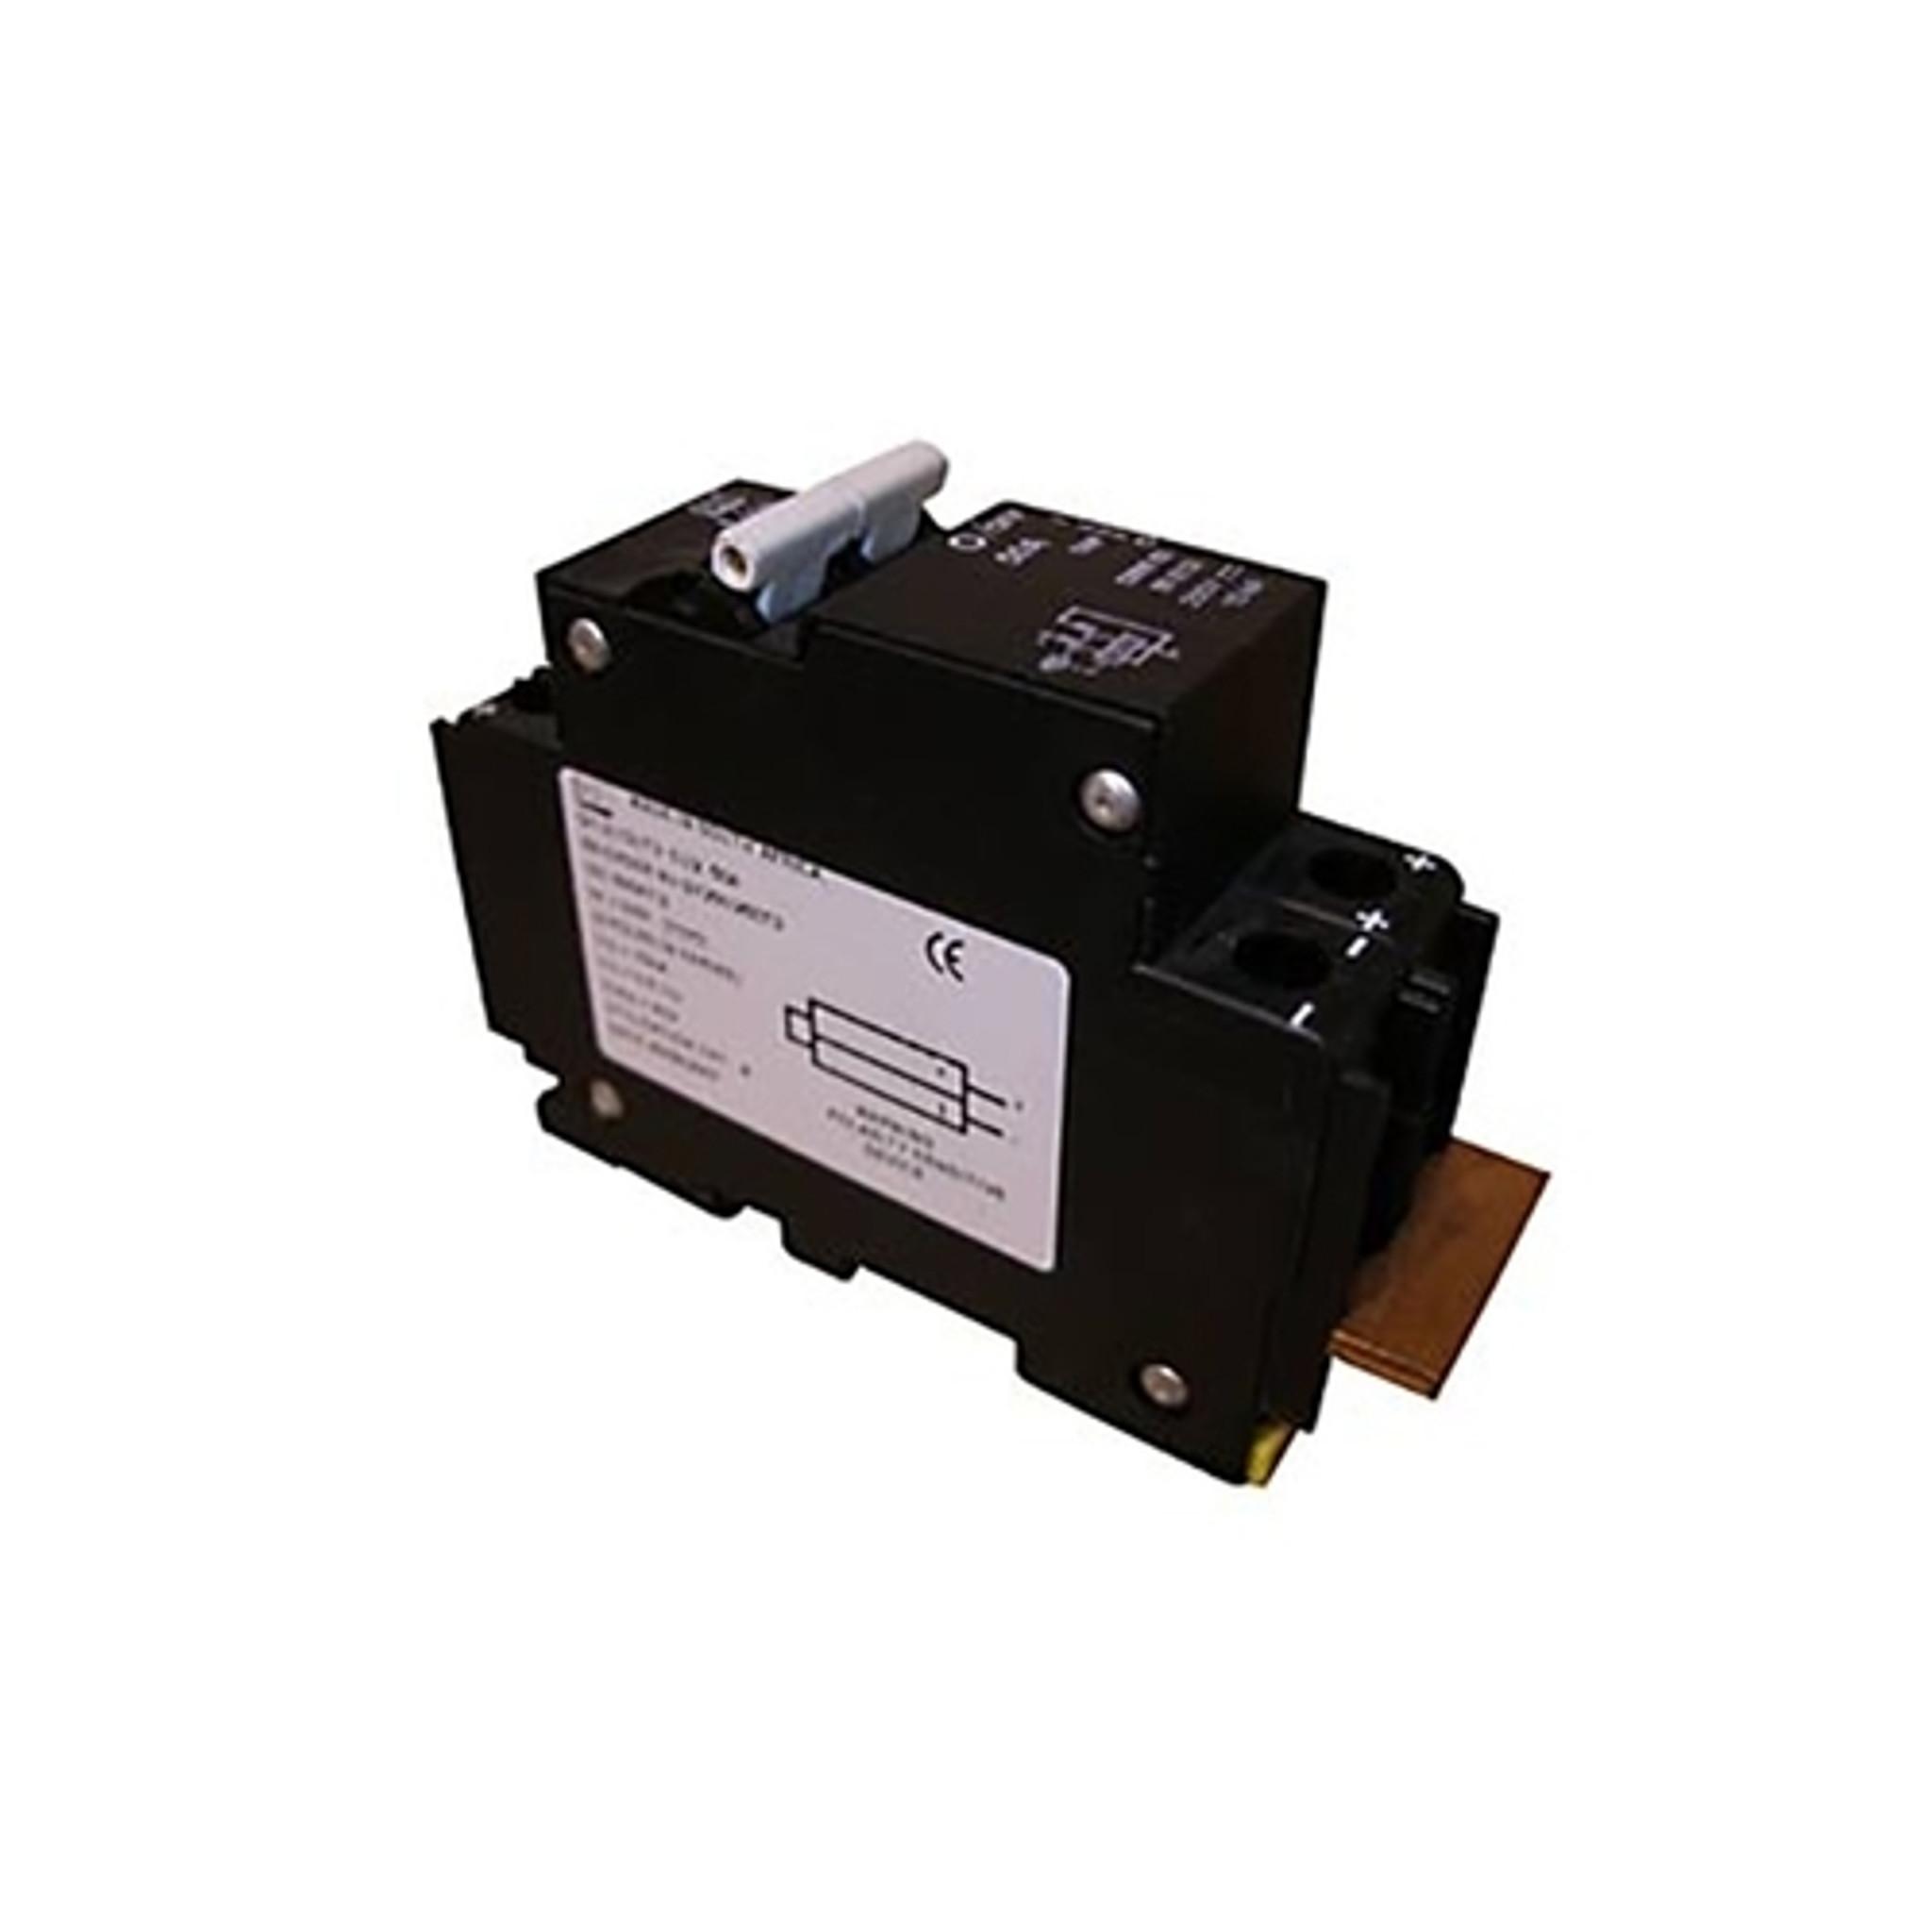 small resolution of  midnite solar 15a 150 circuit breaker